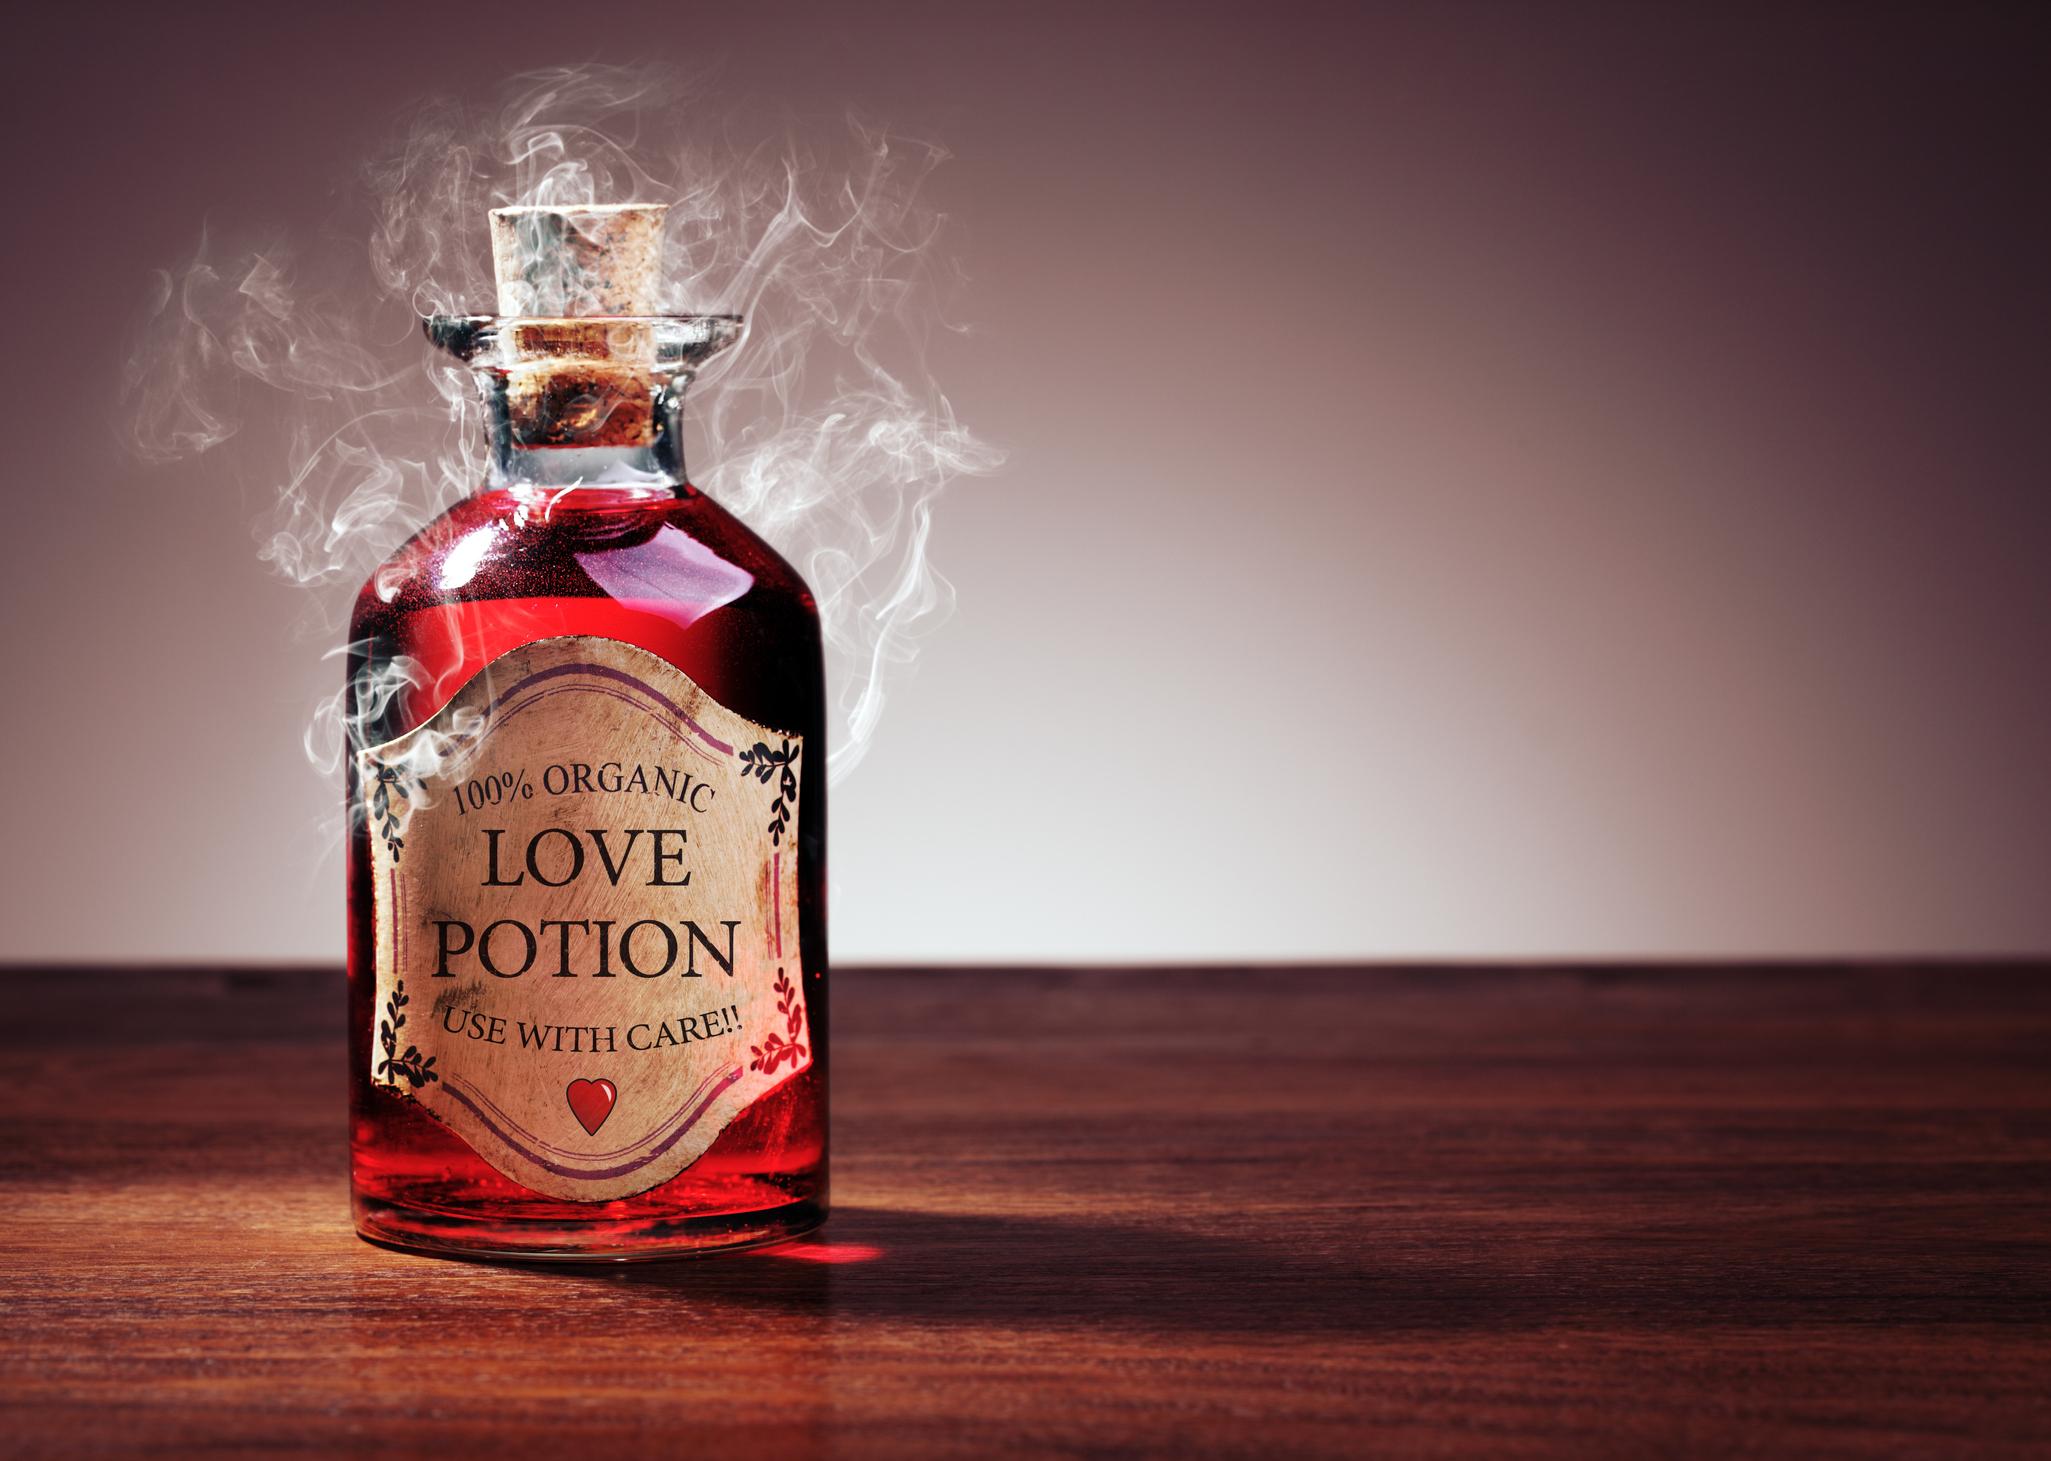 Herbal Love Potion Aphrodisiac